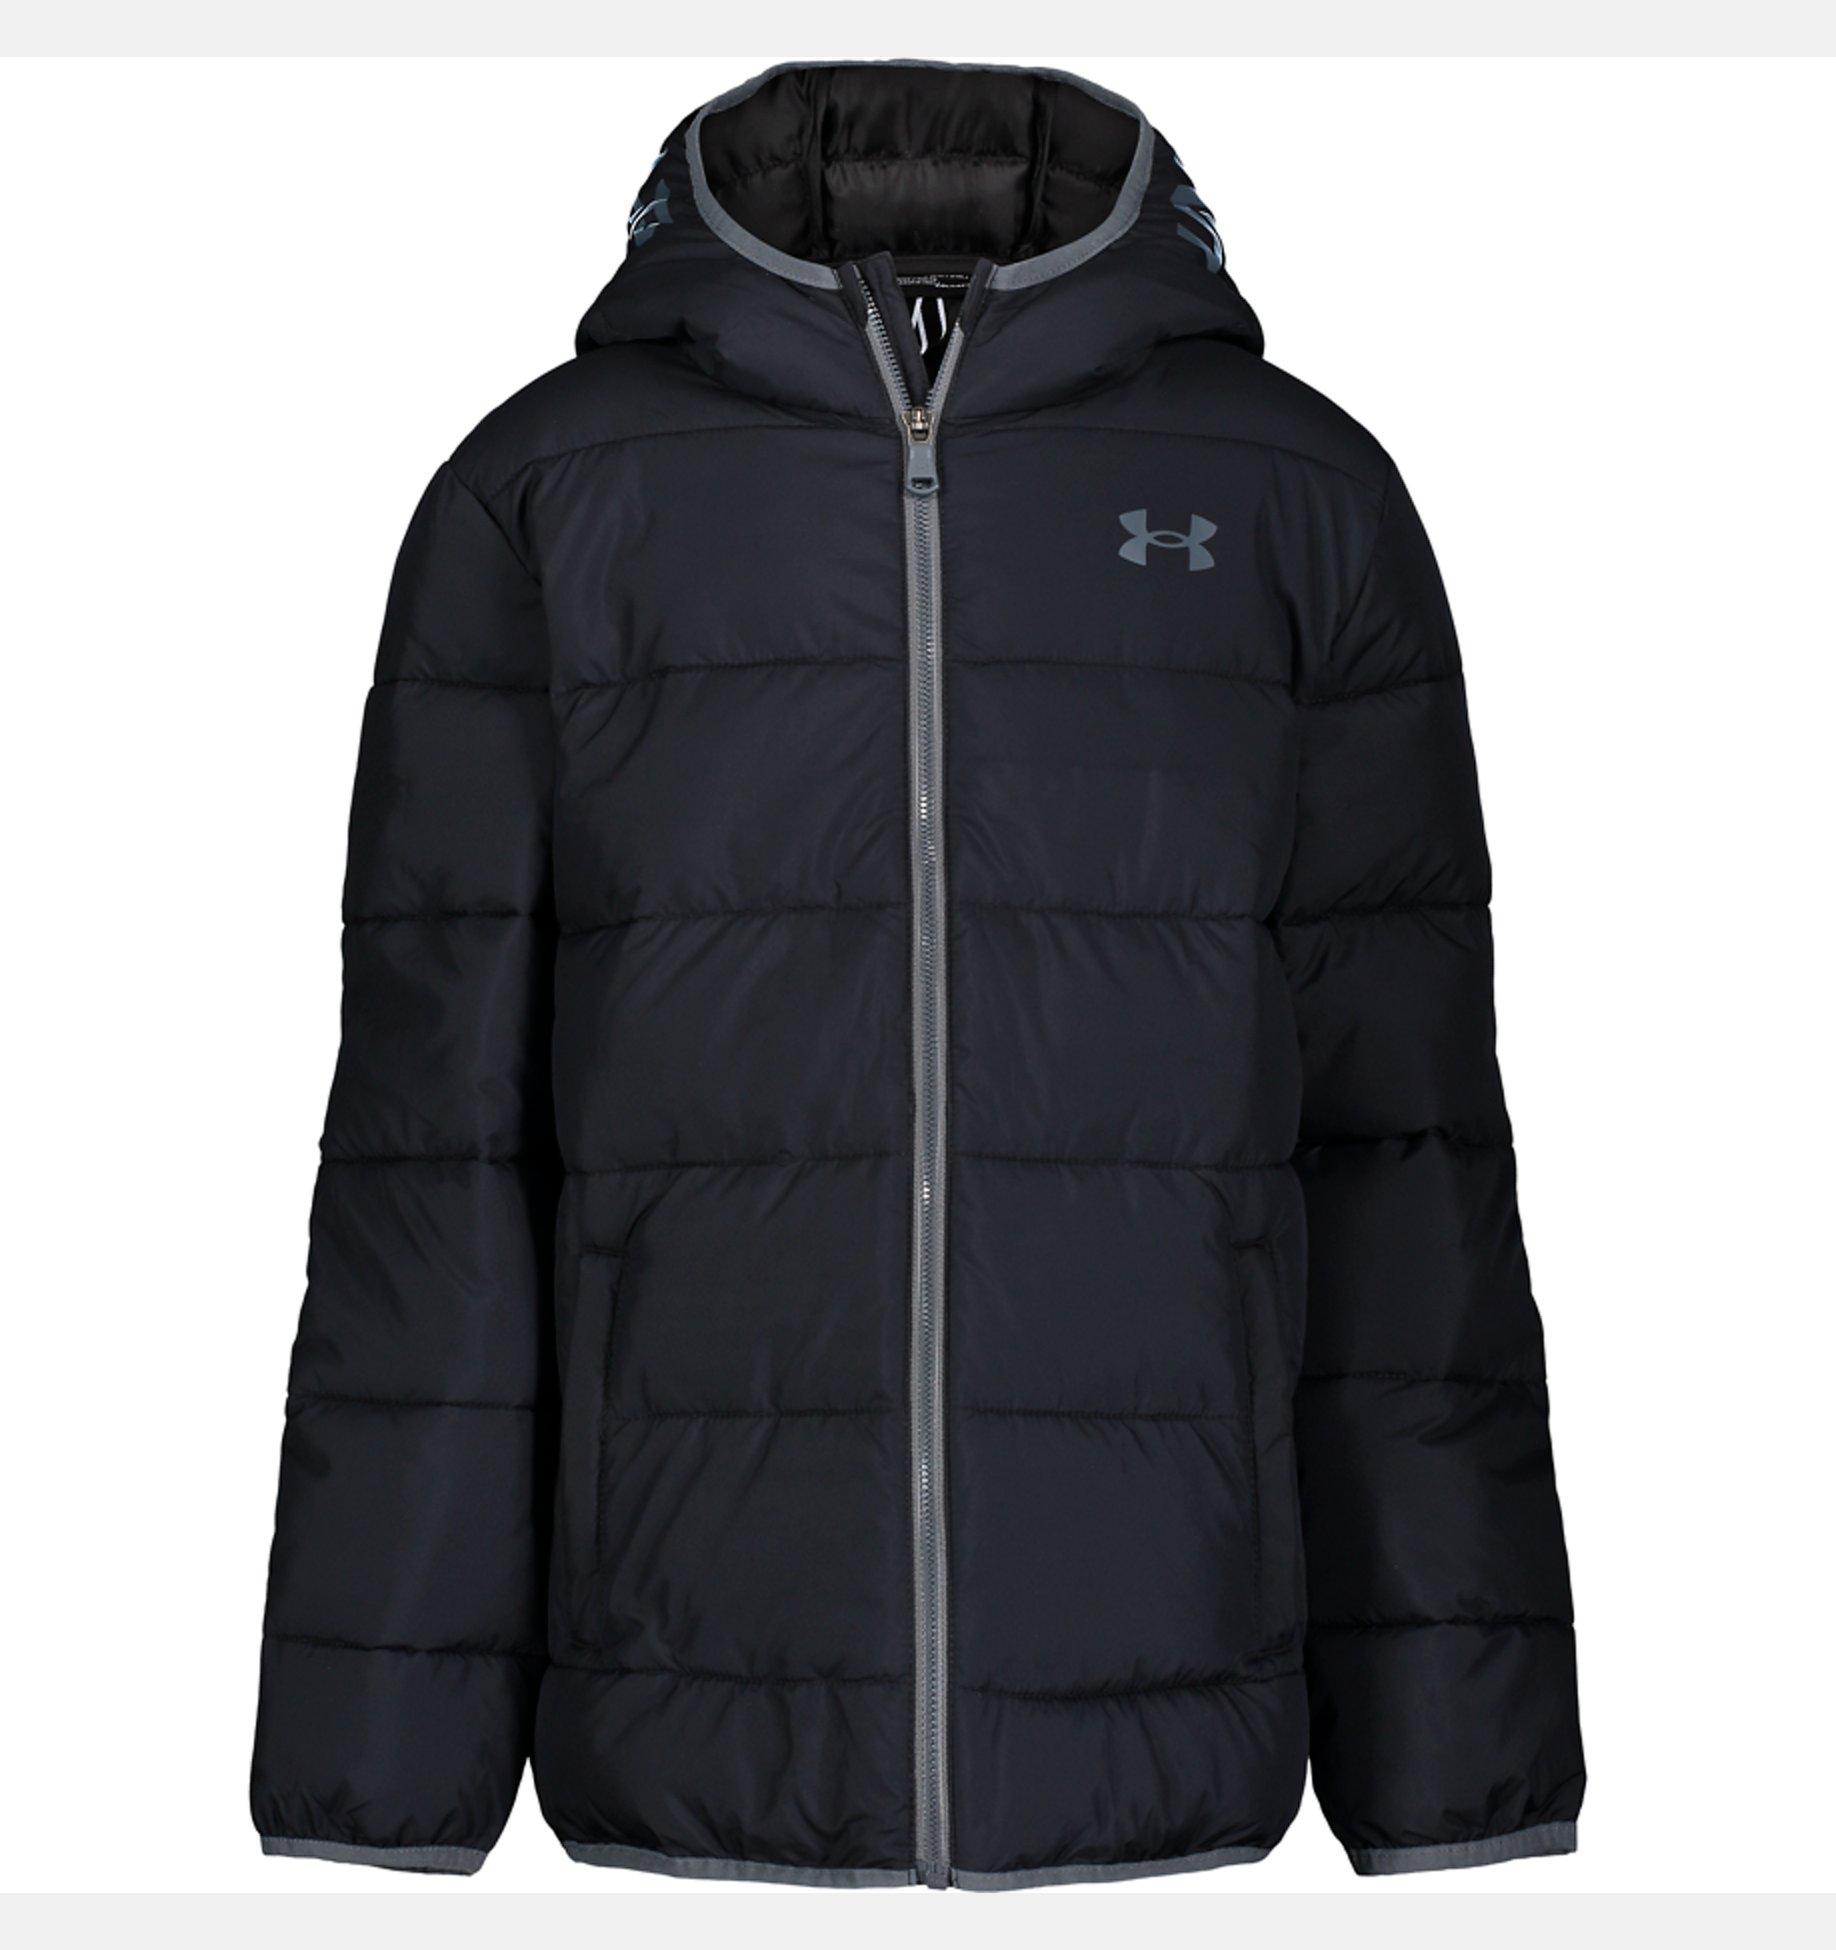 Underarmour Boys Toddler UA Pronto Puffer Jacket